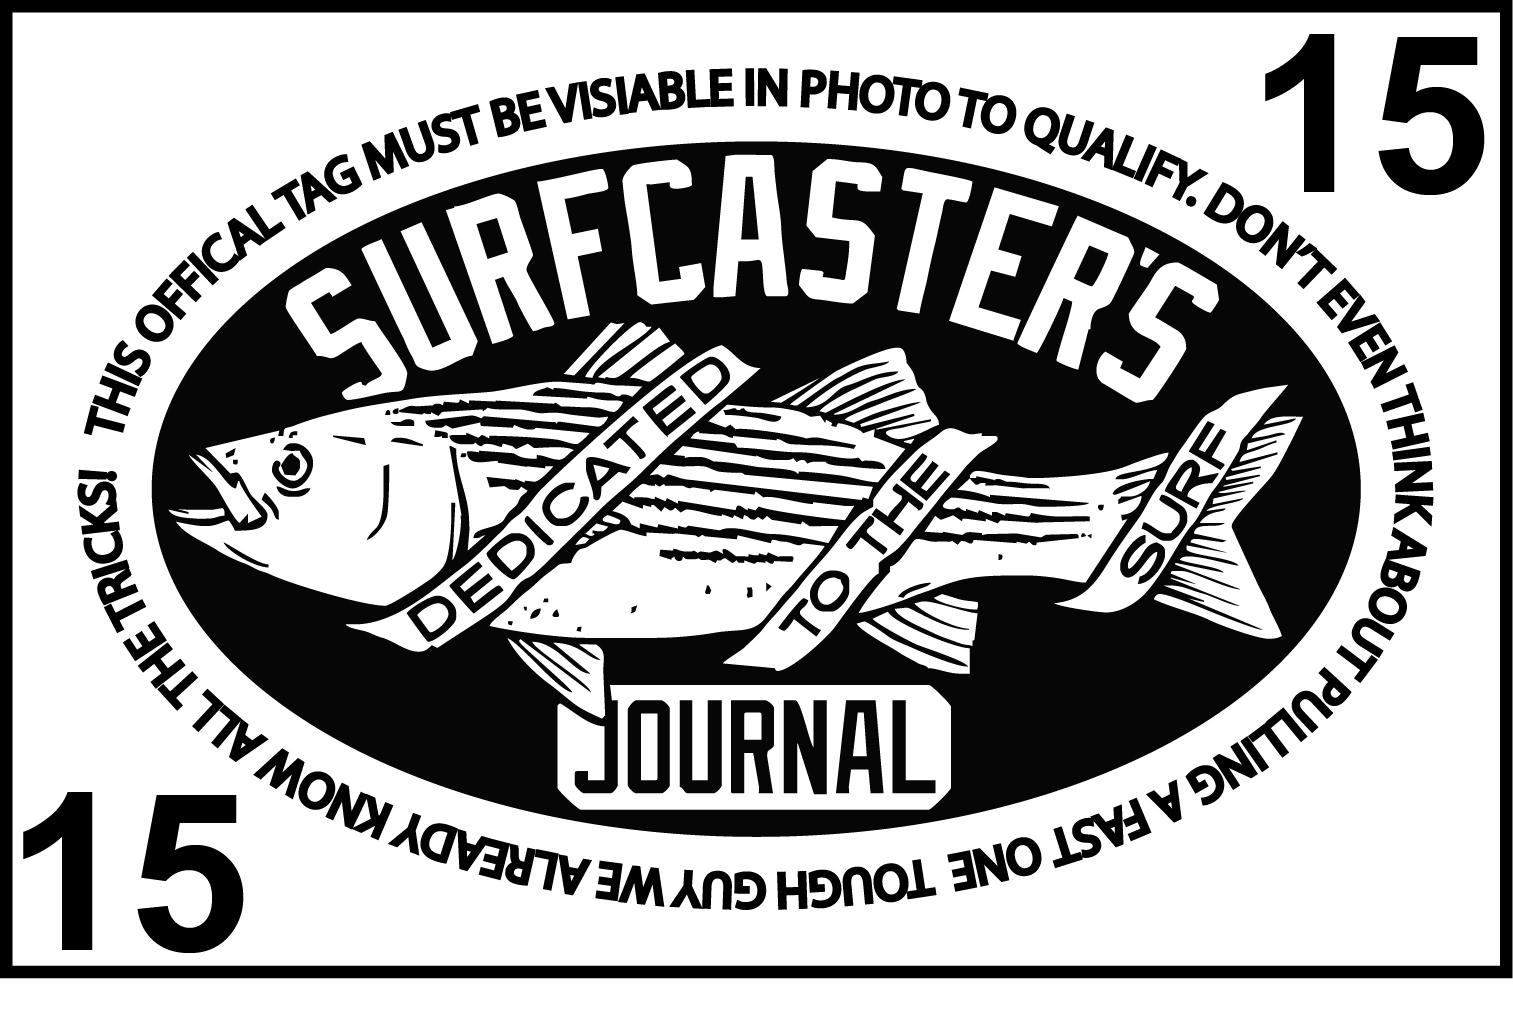 Aquaskinz leader Wallet pour surfcasting ou FLY FISH